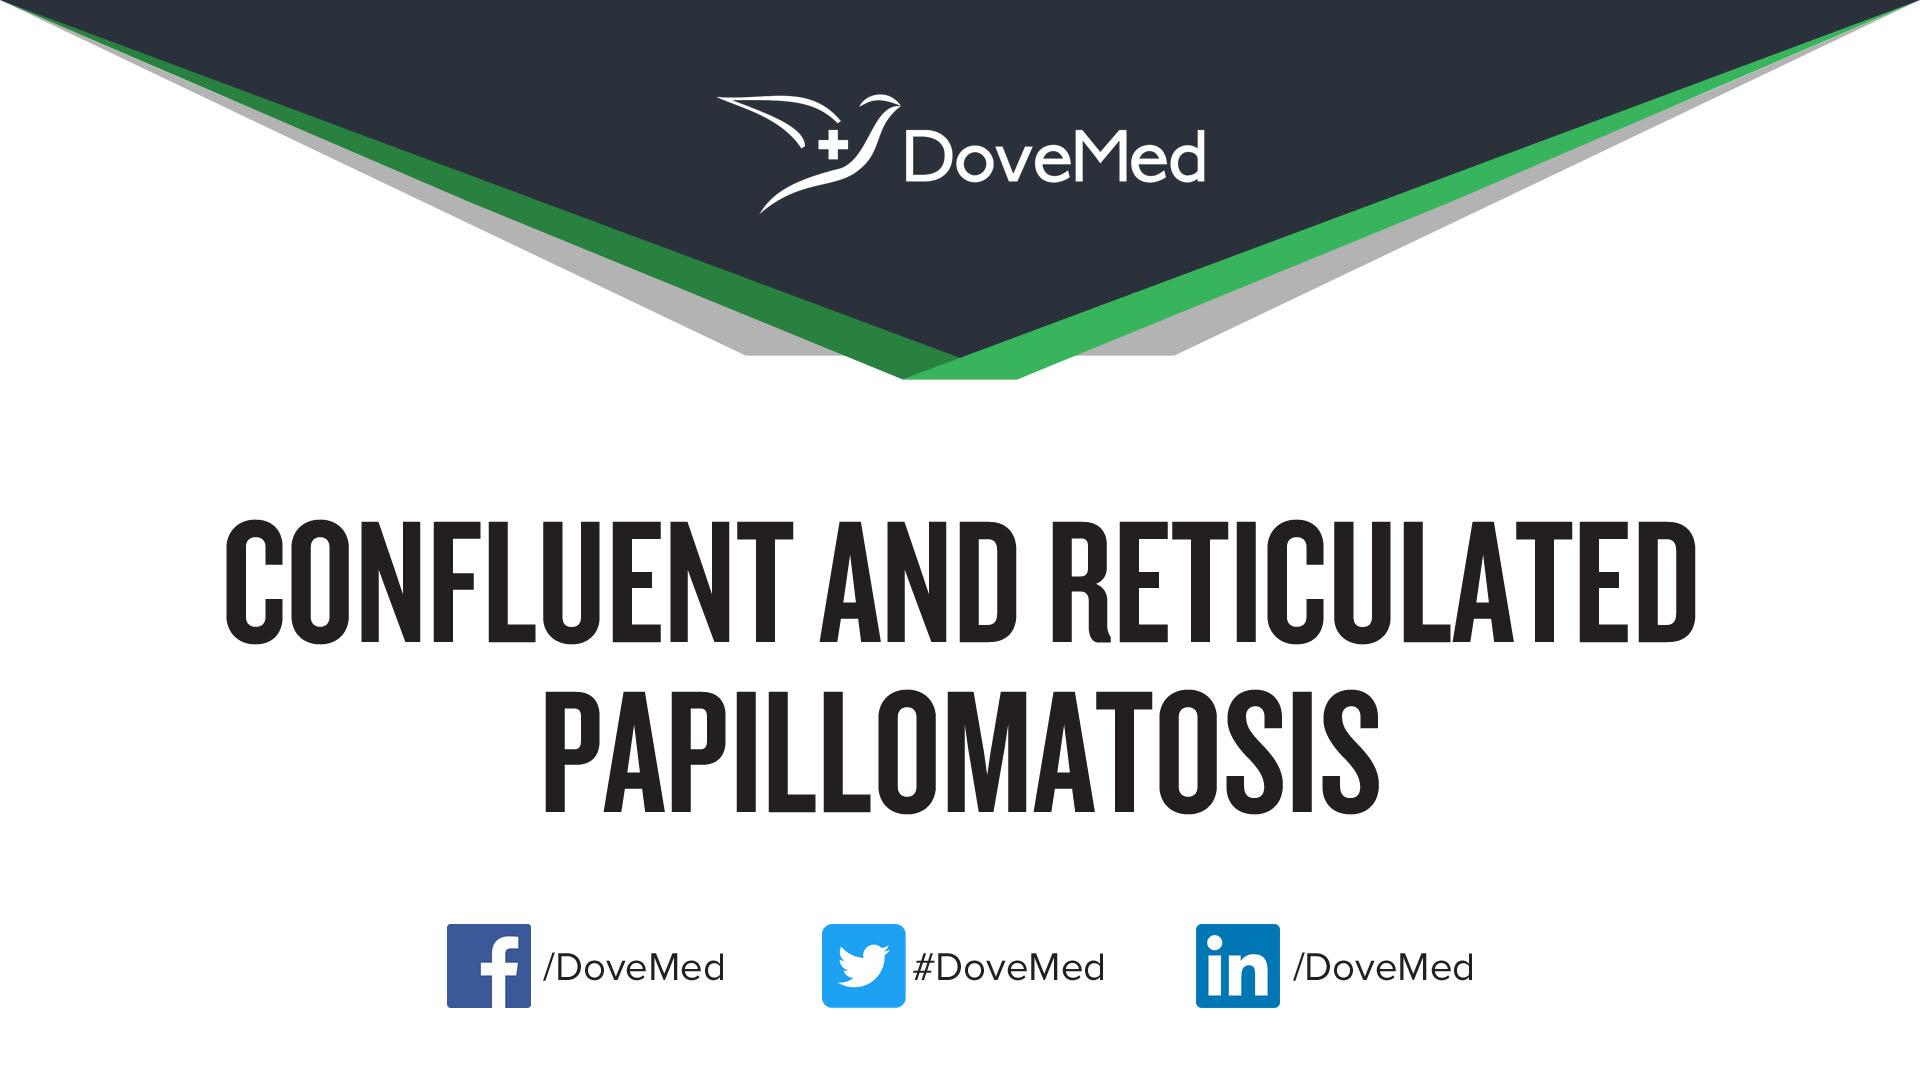 chronic reticulated papillomatosis anemia 5 de hemoglobina